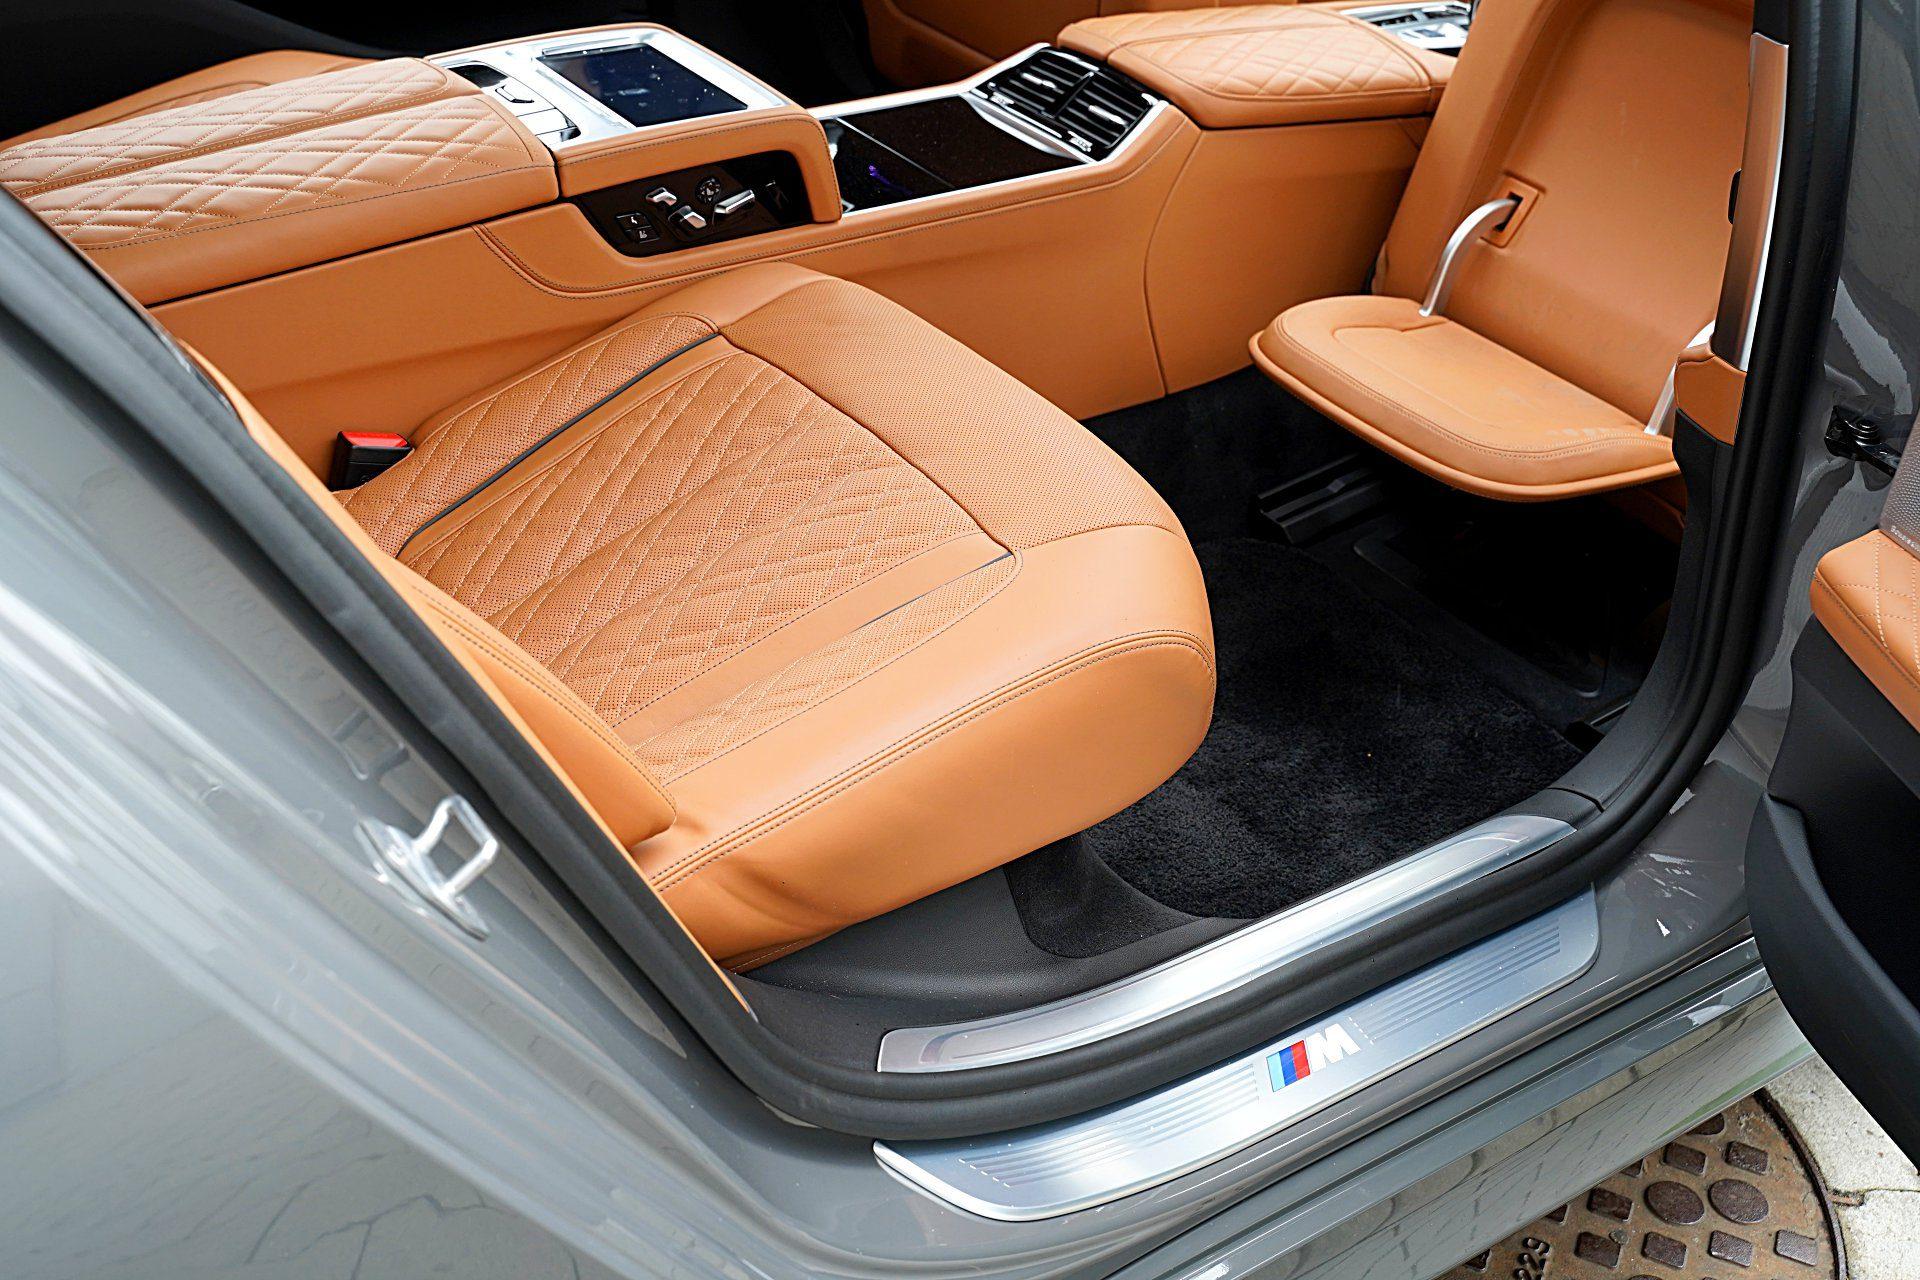 BMW 745Le G12 FL Plug-In Hybrid 3.0T podnóżek